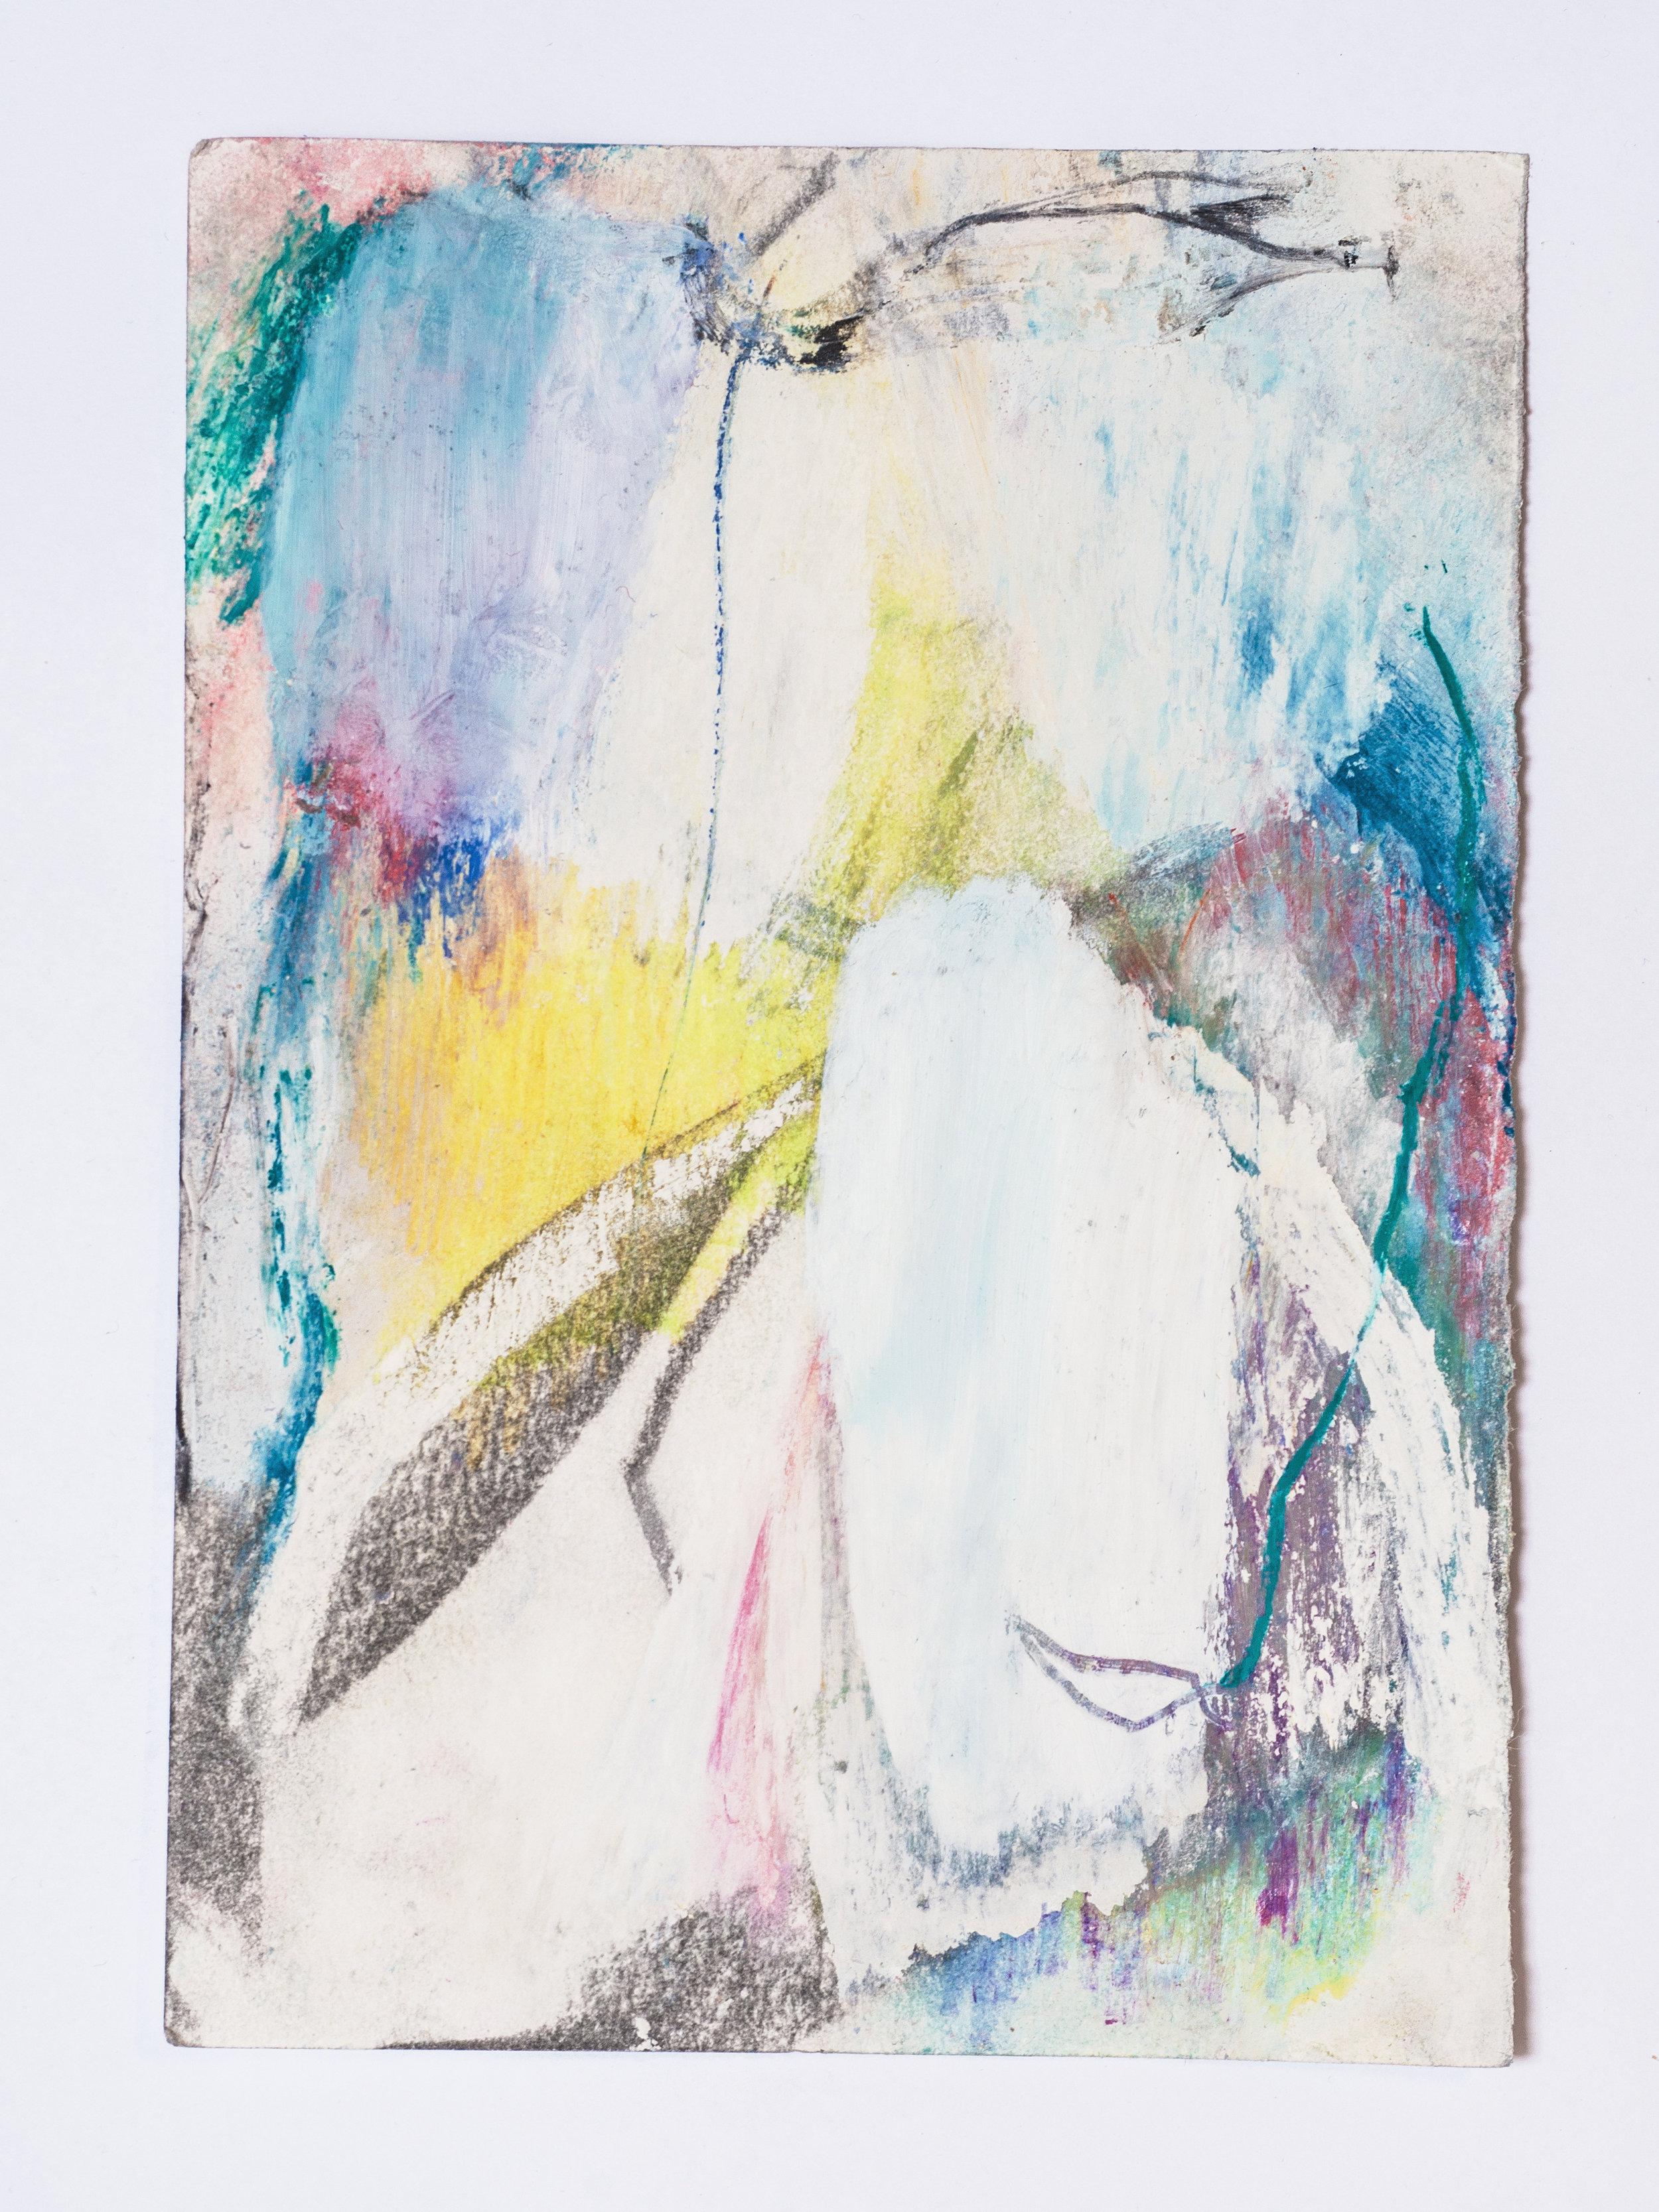 Sophie Heinrich  Untitled, 2018 Oil and Pastel on Paper 21 x 14 cm 480 EUR